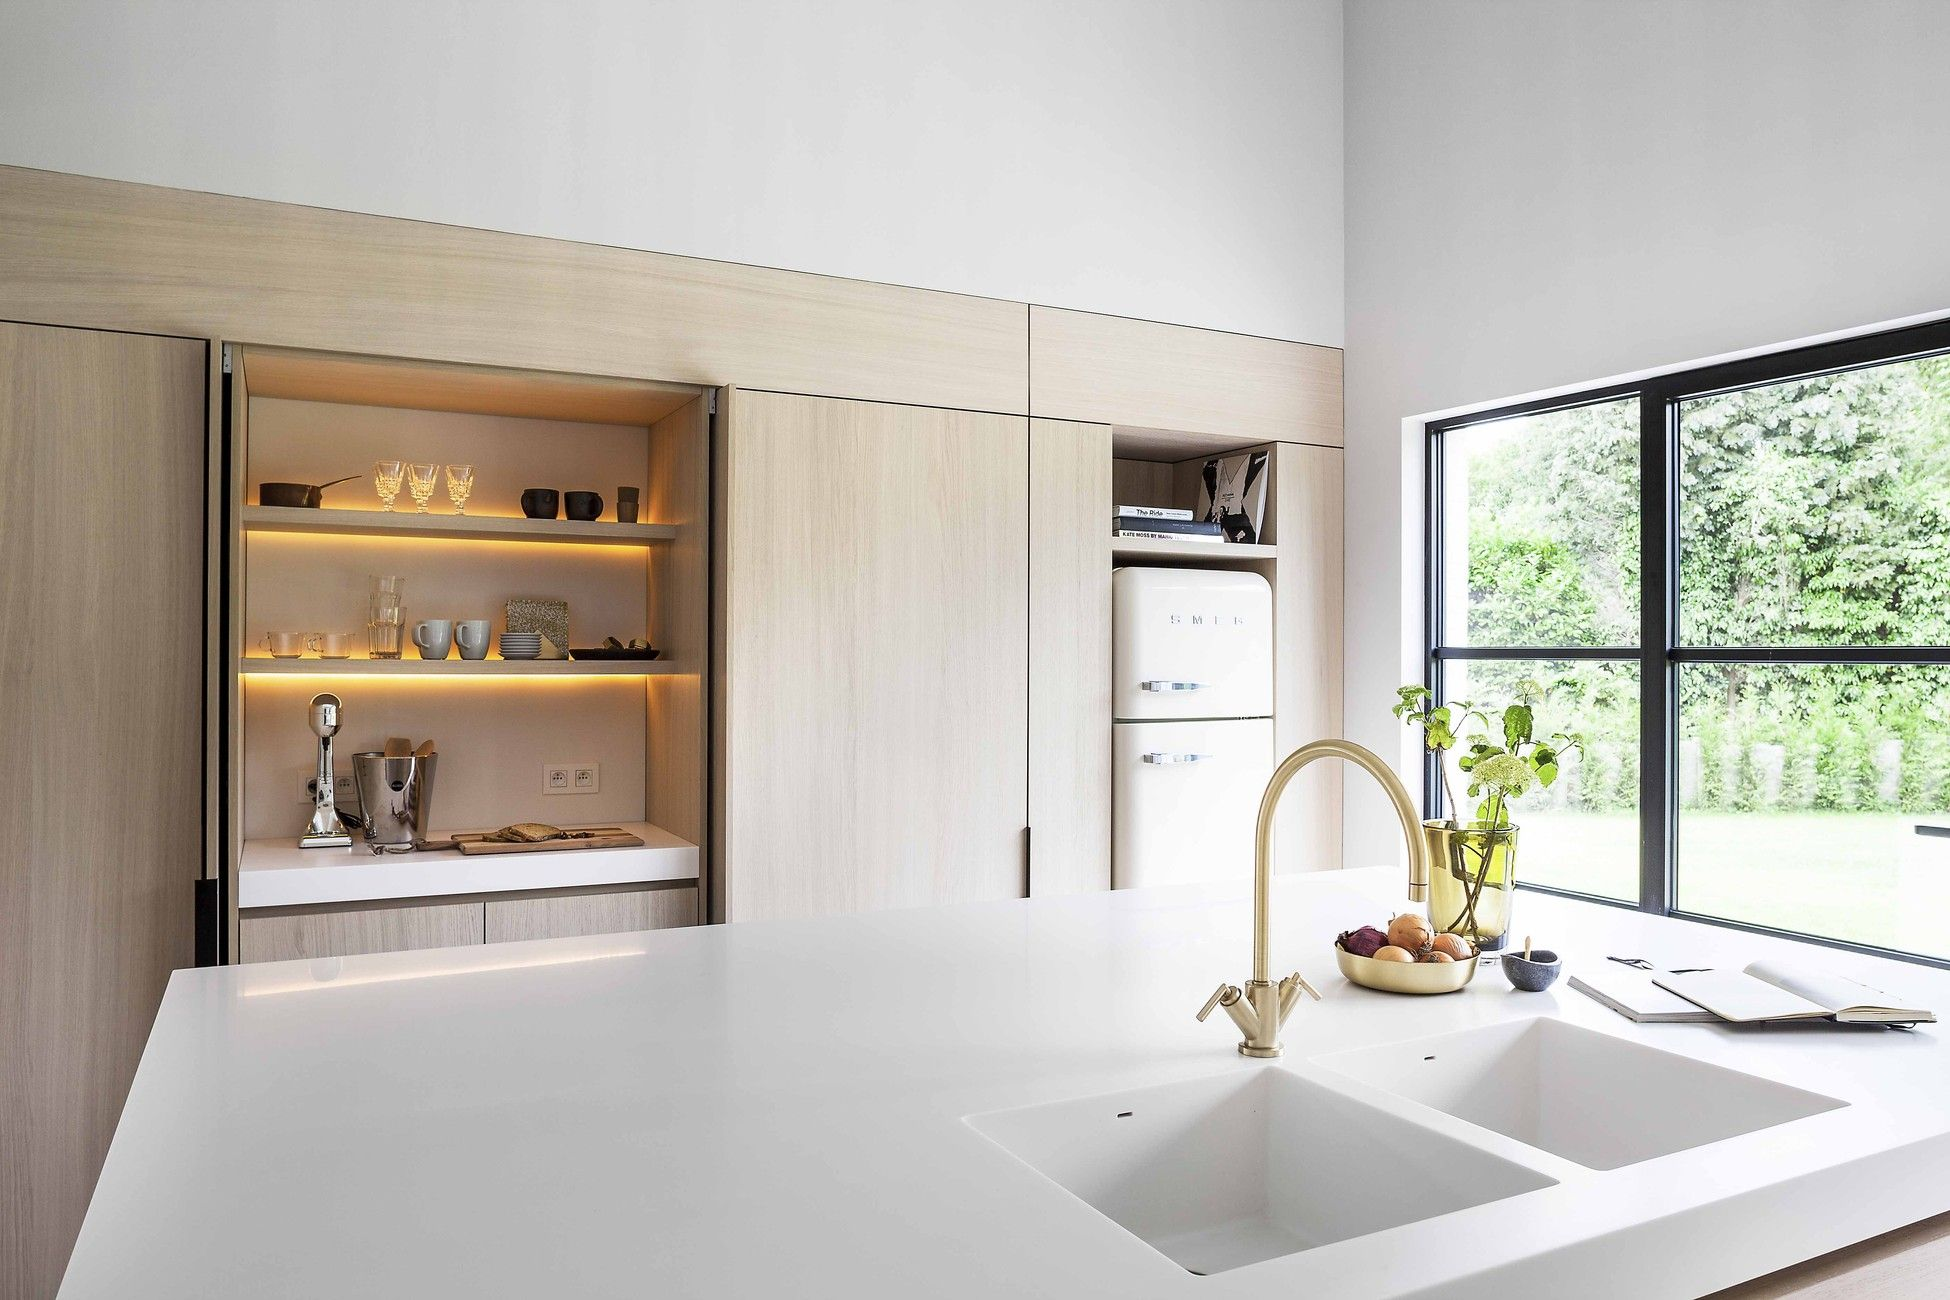 Project K Projecten Juma Architects Keuken Interieur Keuken Ontwerp Moderne Keukens